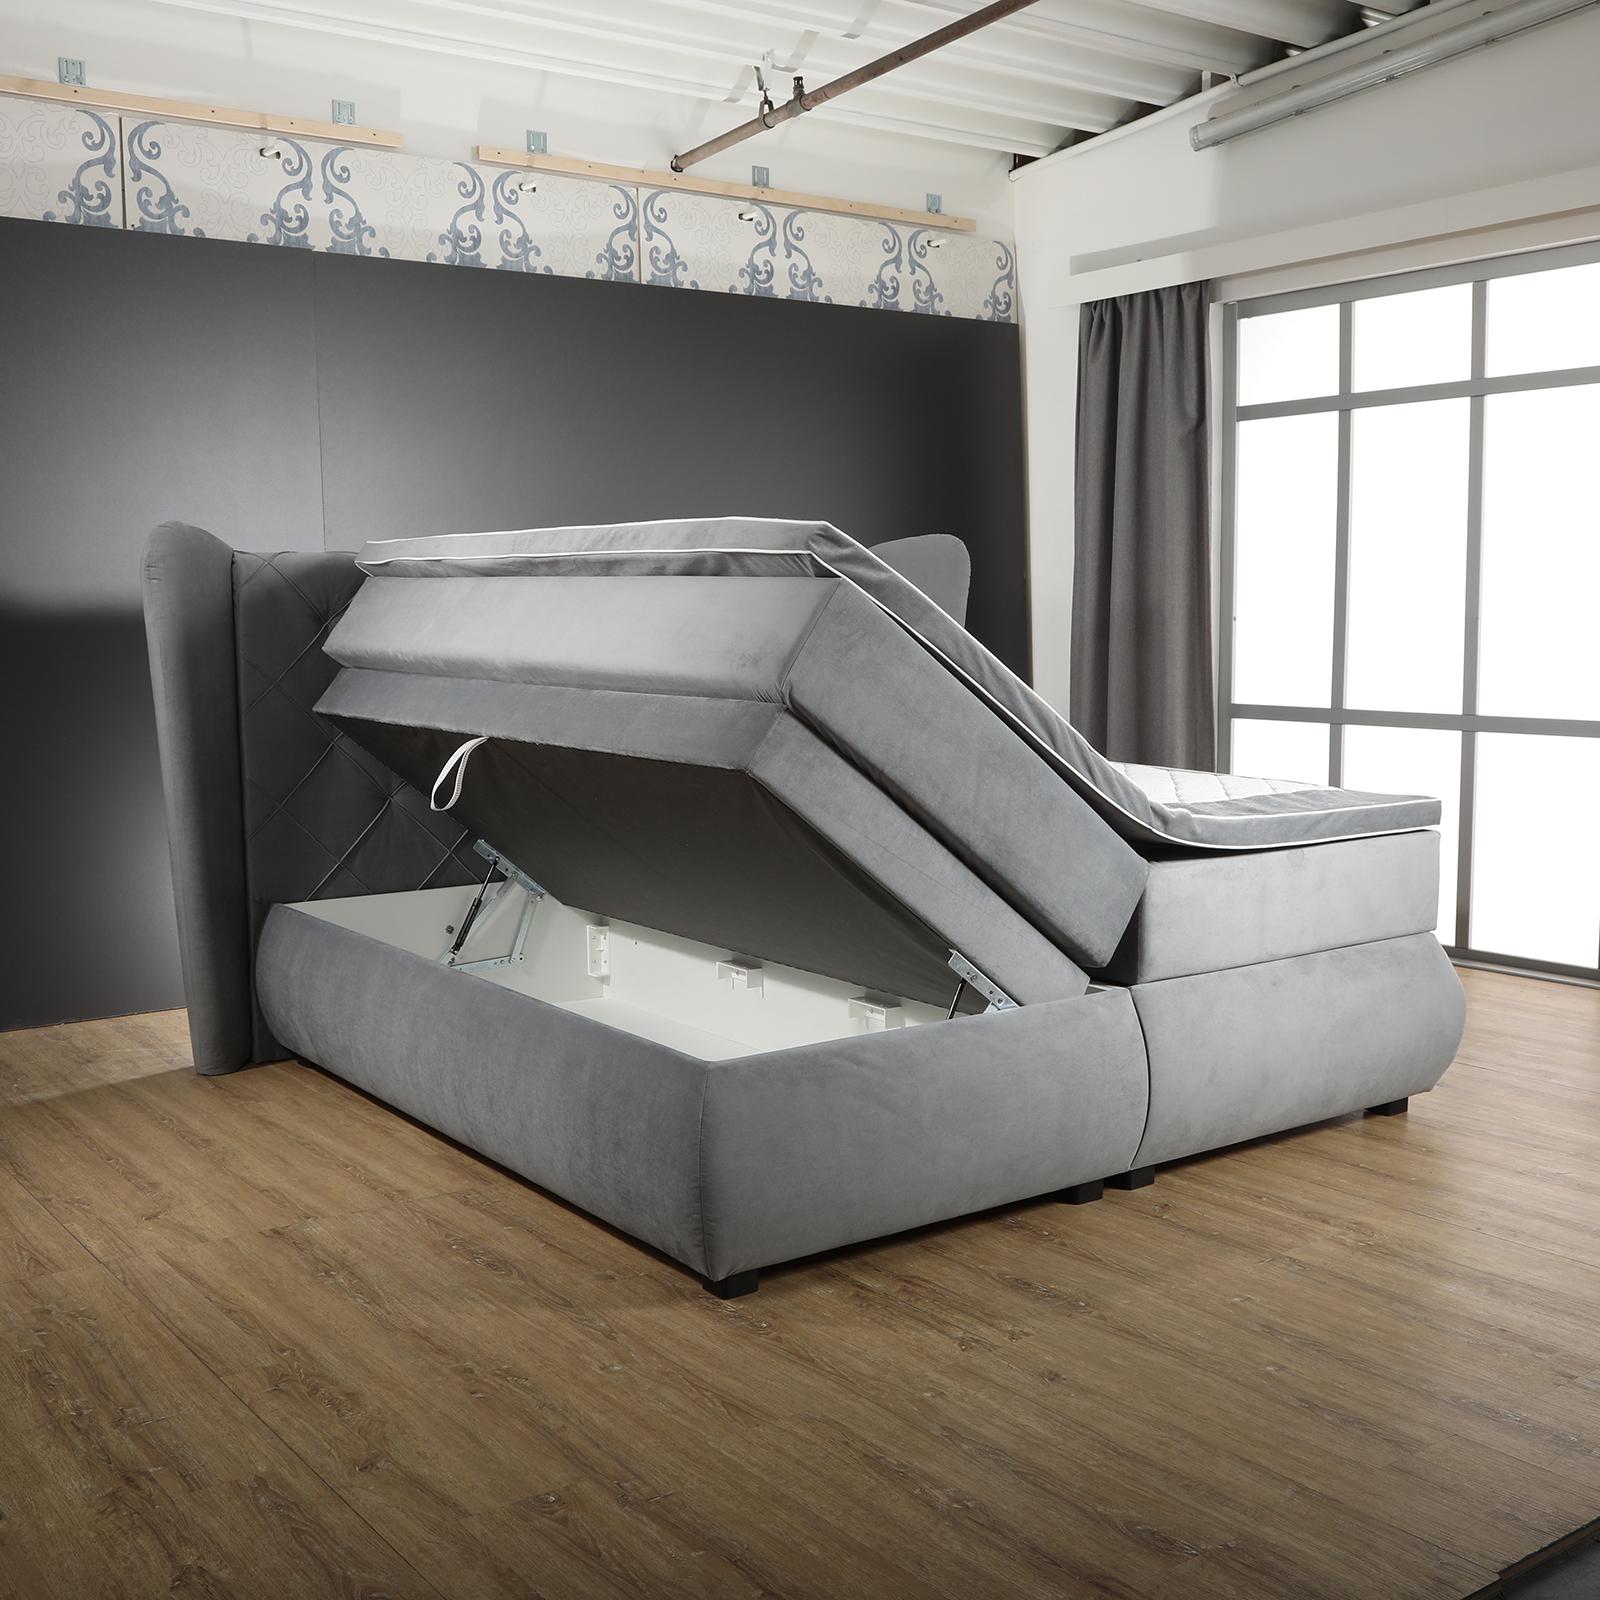 boxspringbett grau 180x200 cm online bei roller kaufen